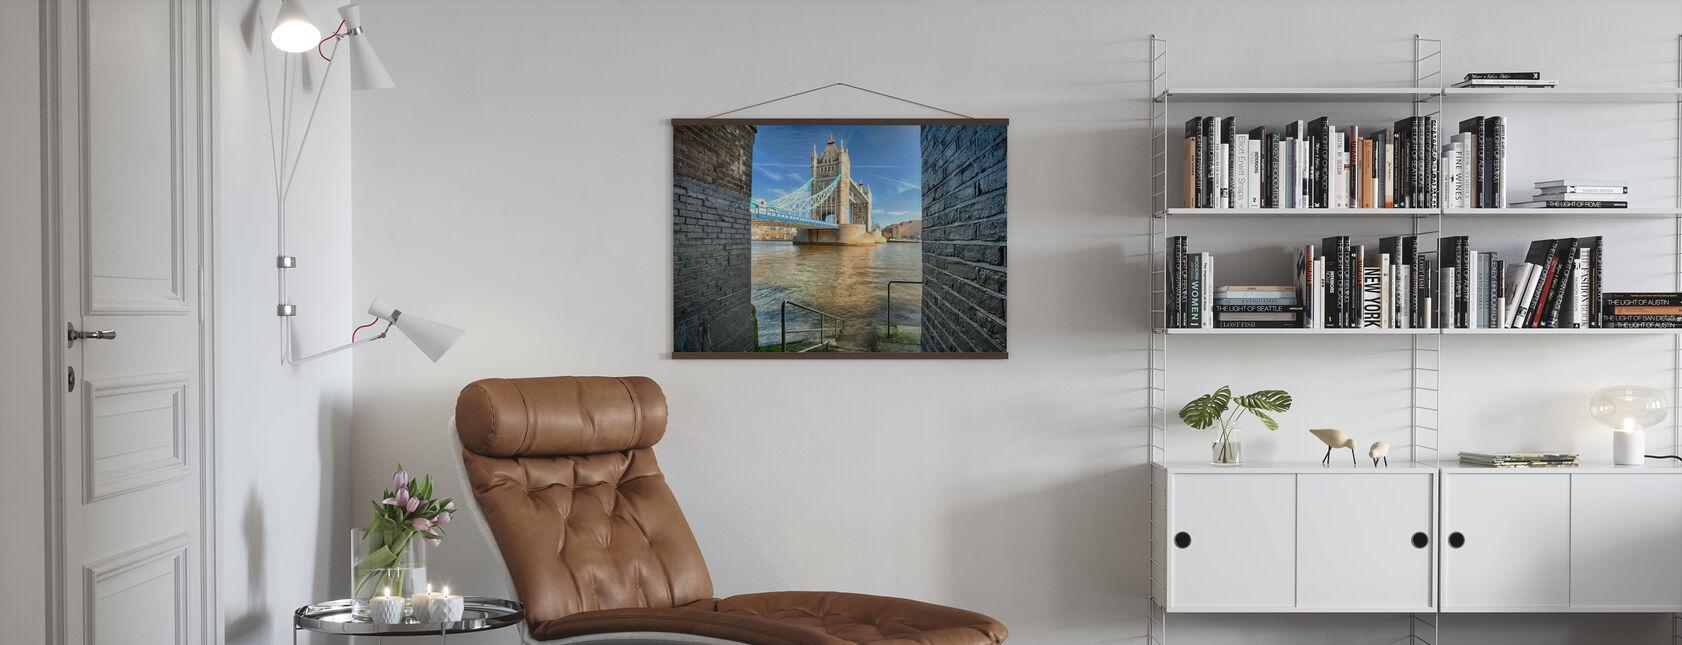 Alternative View on Tower Bridge - Poster - Living Room